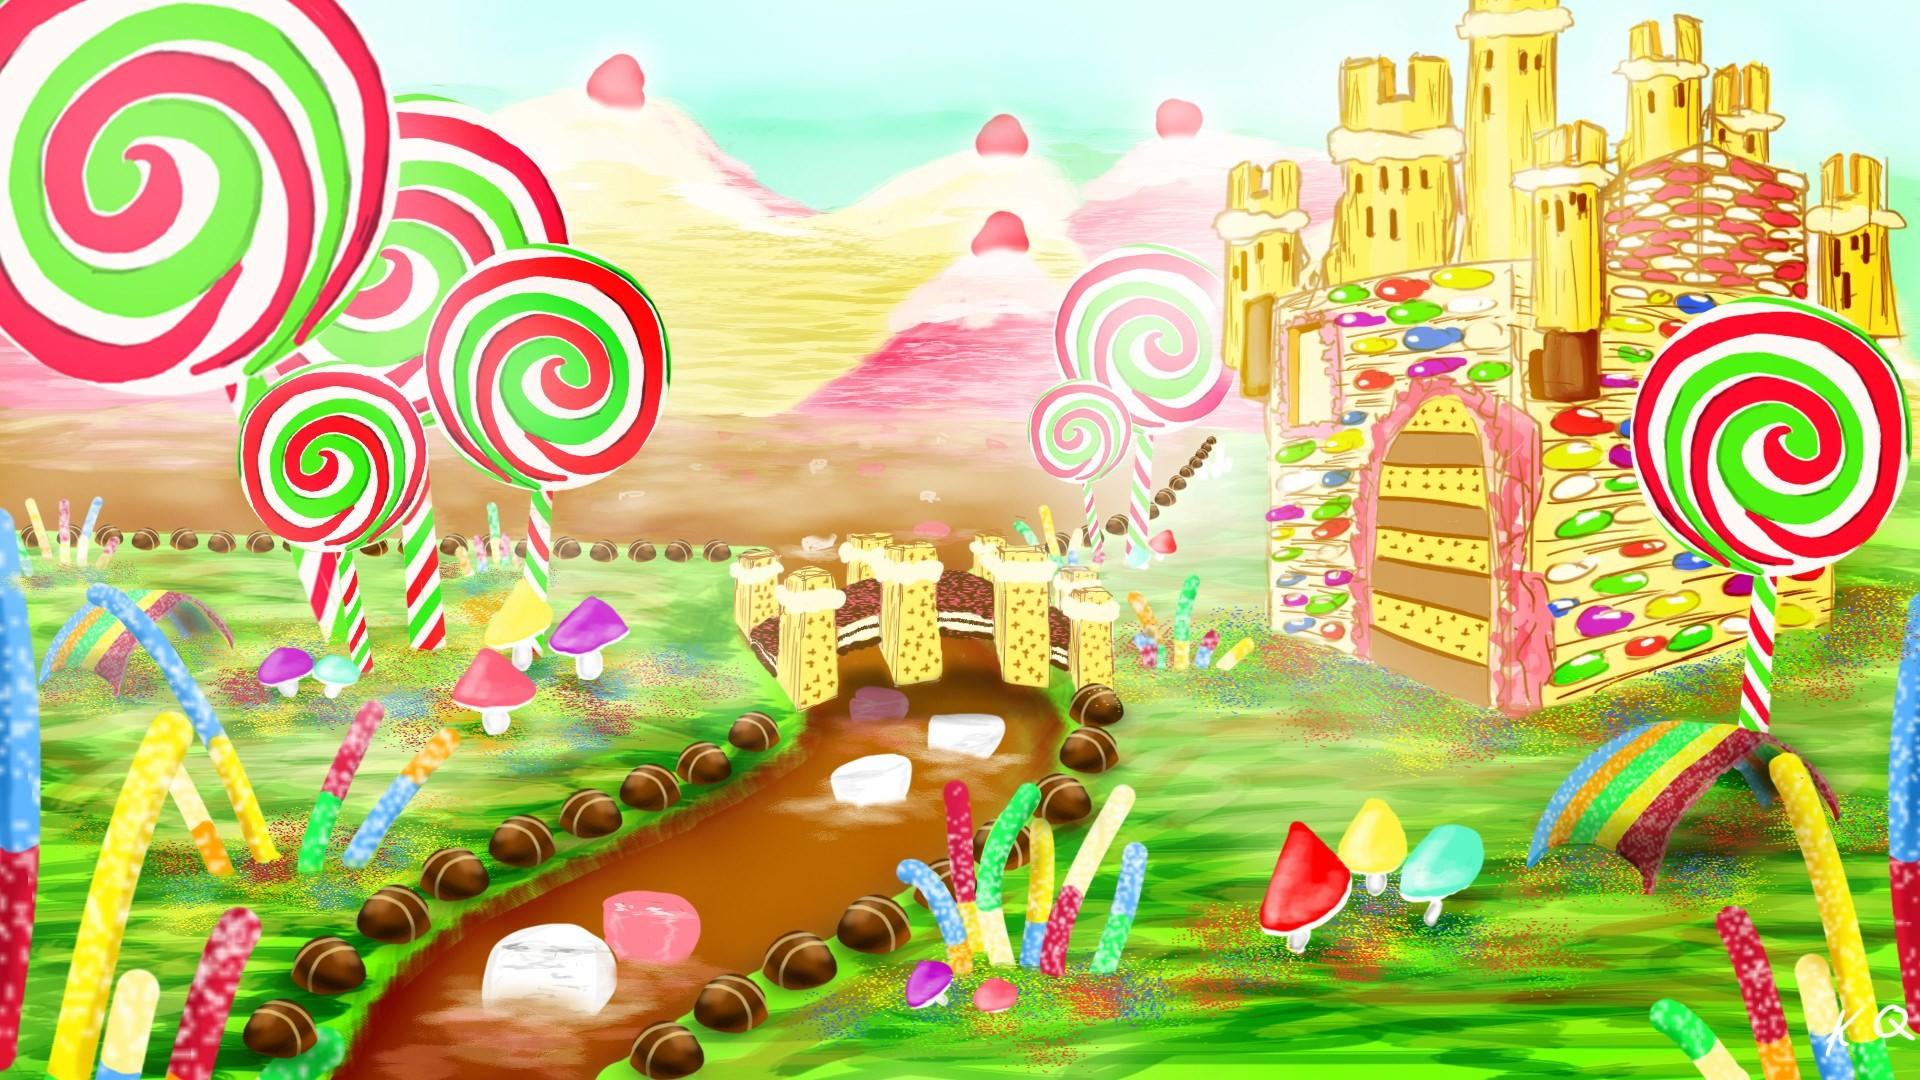 Candyland Background HD Wallpapers Download Free Images Wallpaper [1000image.com]